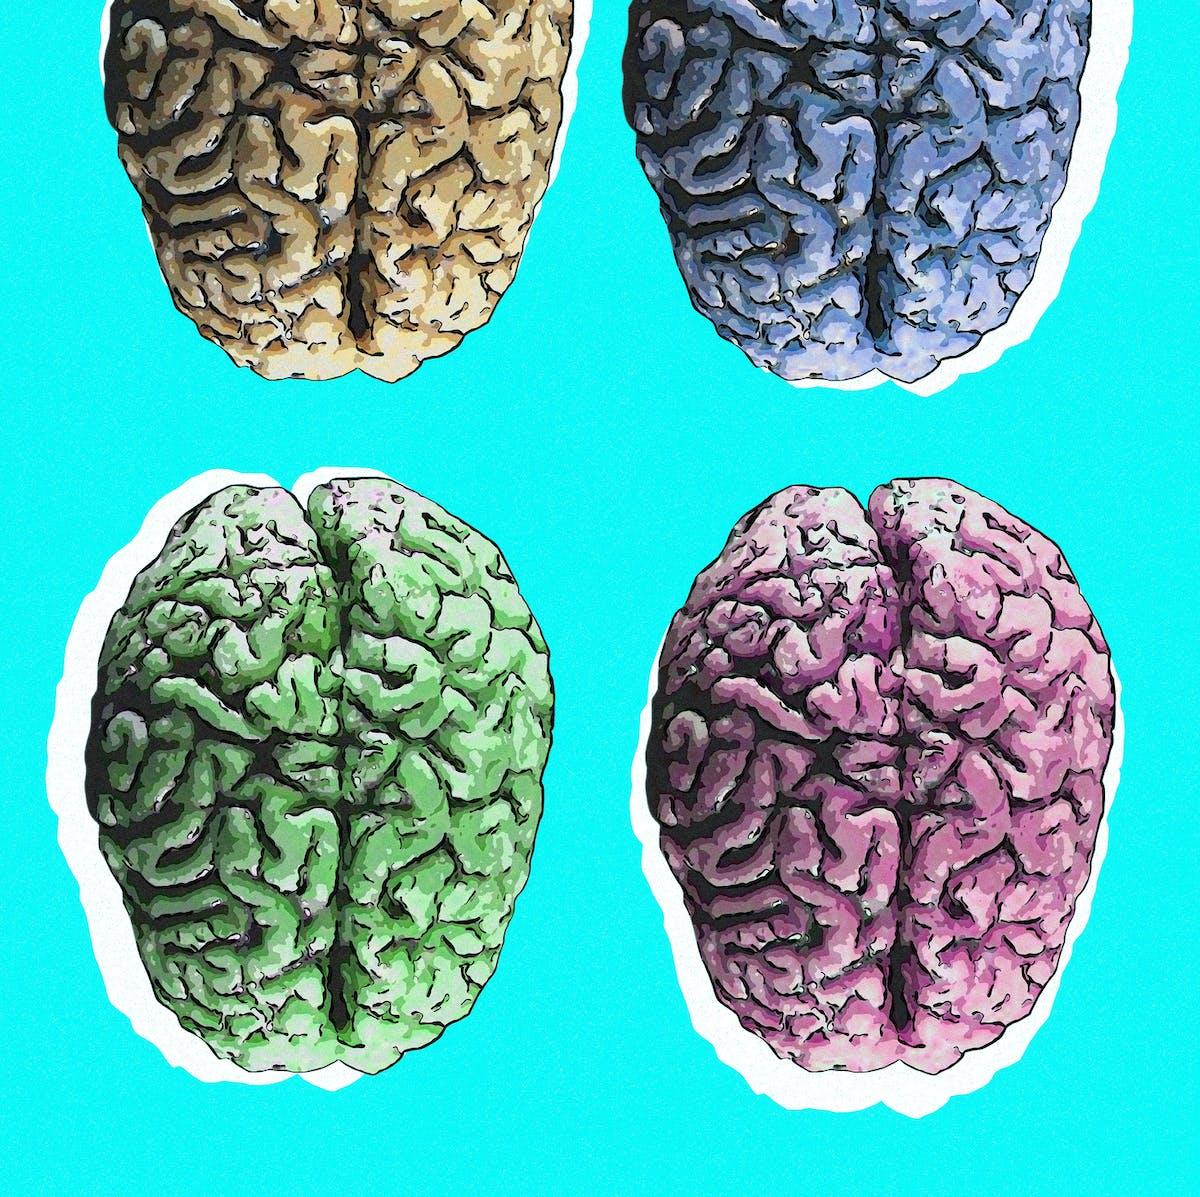 Five next-gen depression treatments that could revolutionize the field